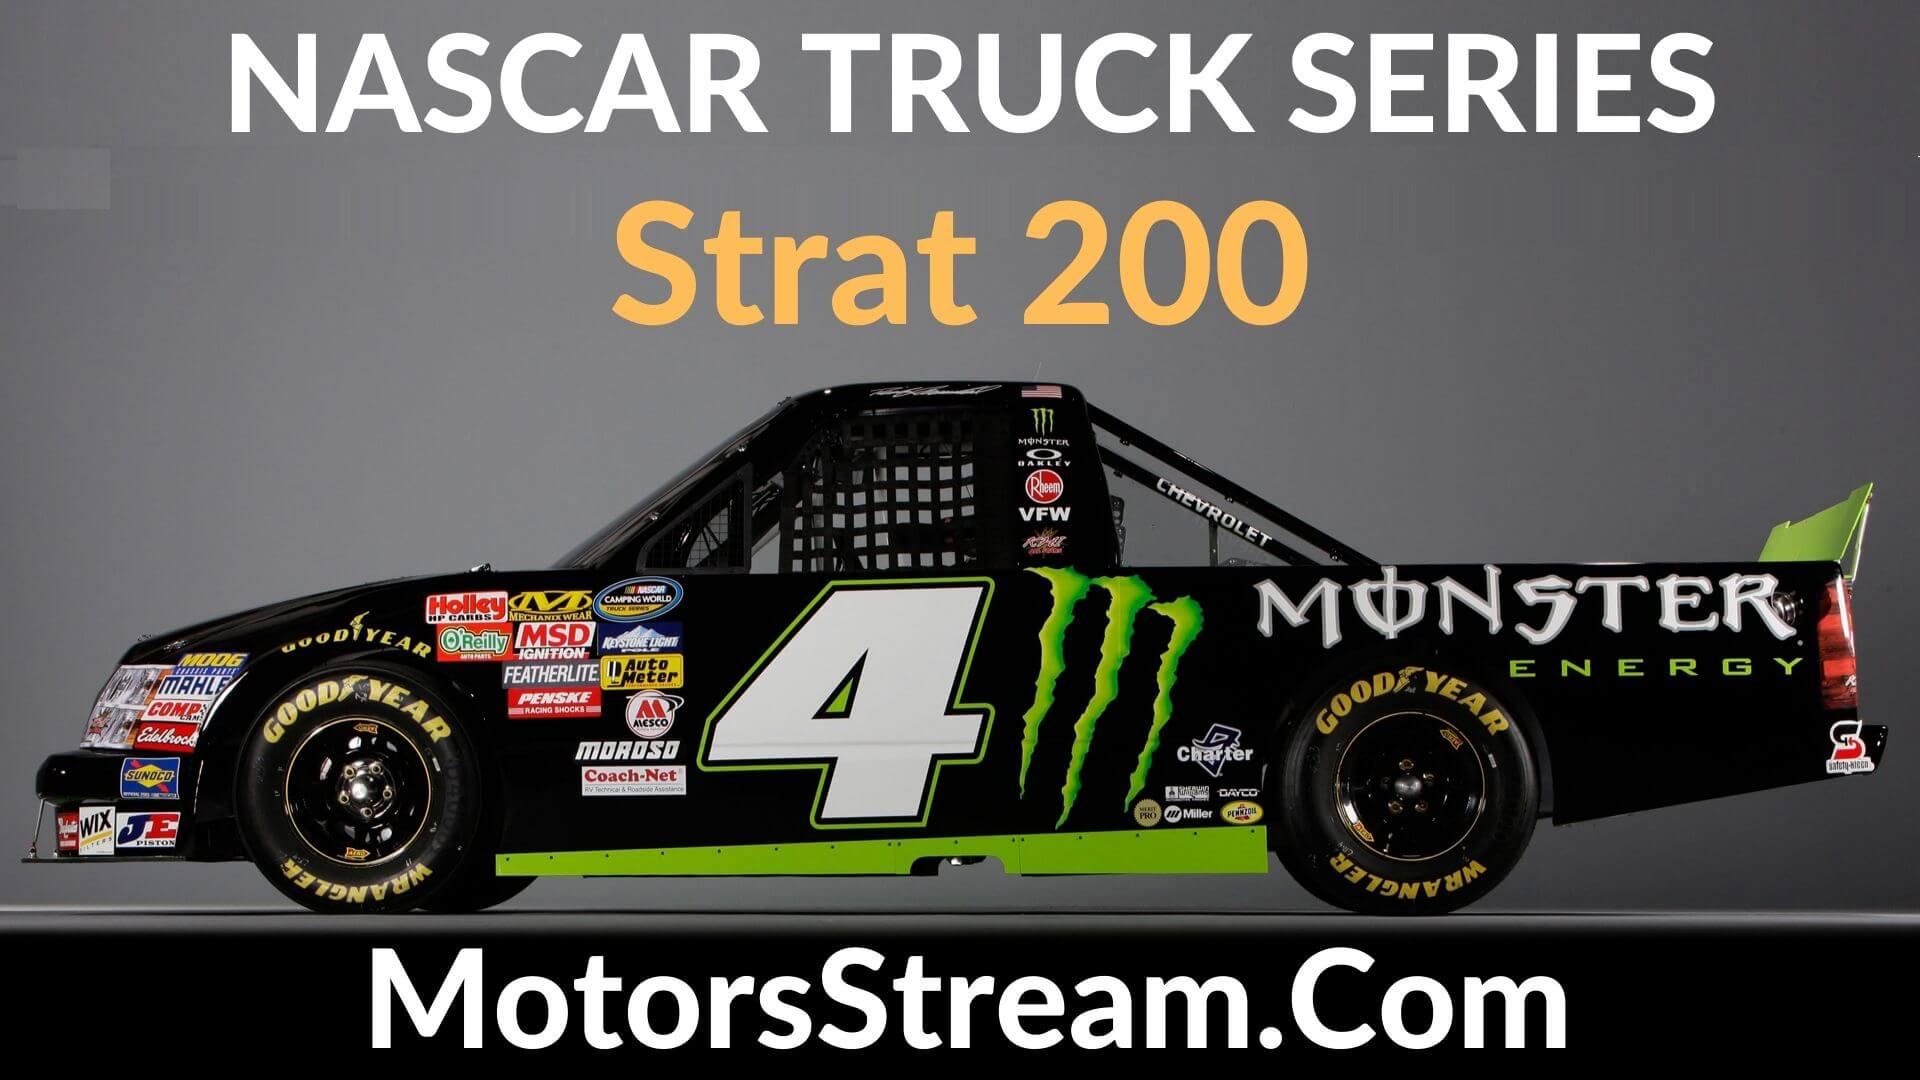 Strat 200 Live Stream   Nascar Truck Series 2020